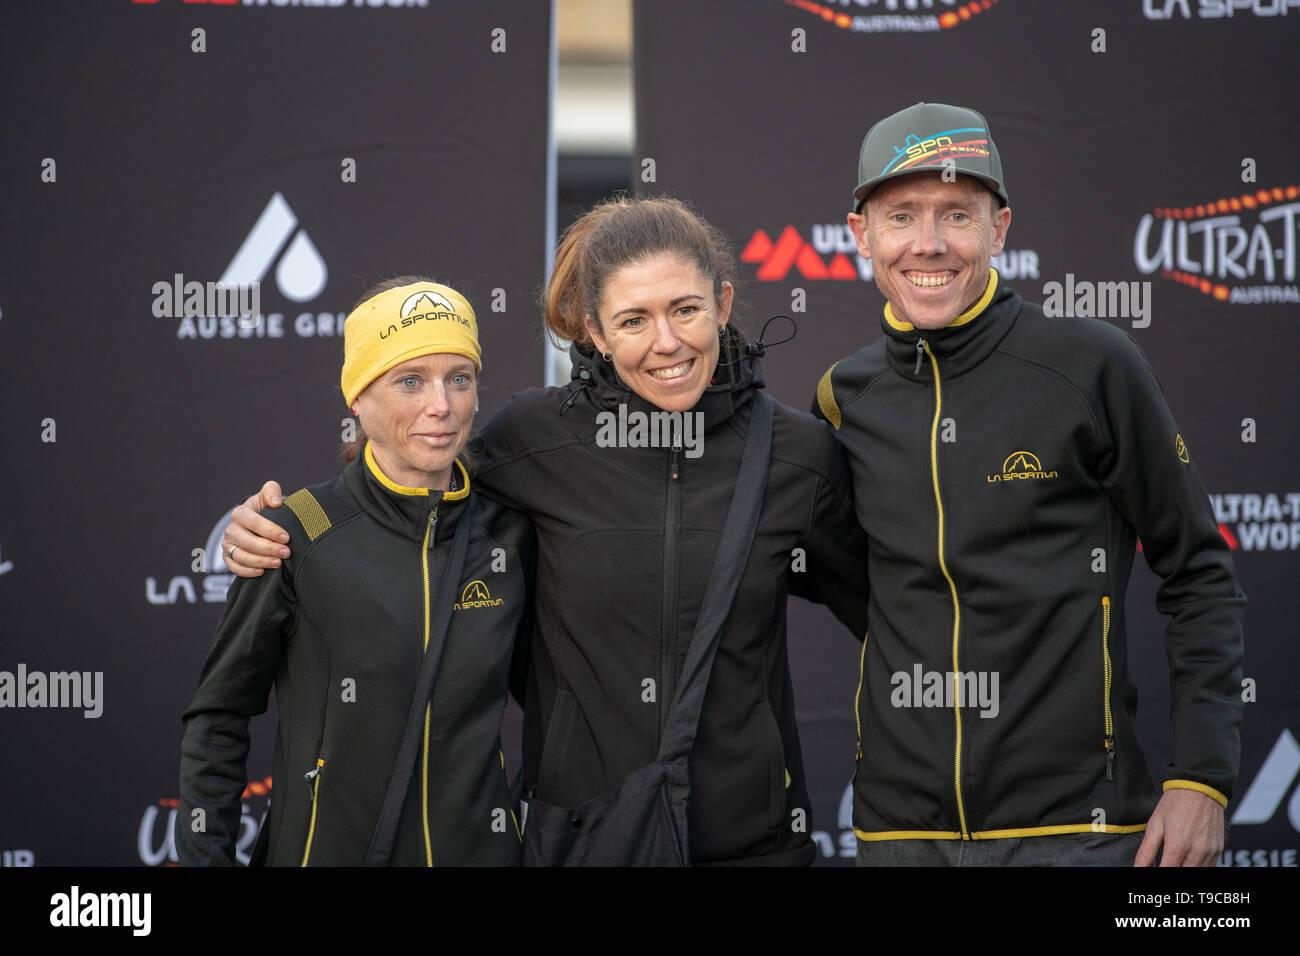 Blue Mountains, Australia - April 16 2019: Ultra-Trail Australia UTA11 race. Winner and runner of under 30's women event up on the podium - Stock Image